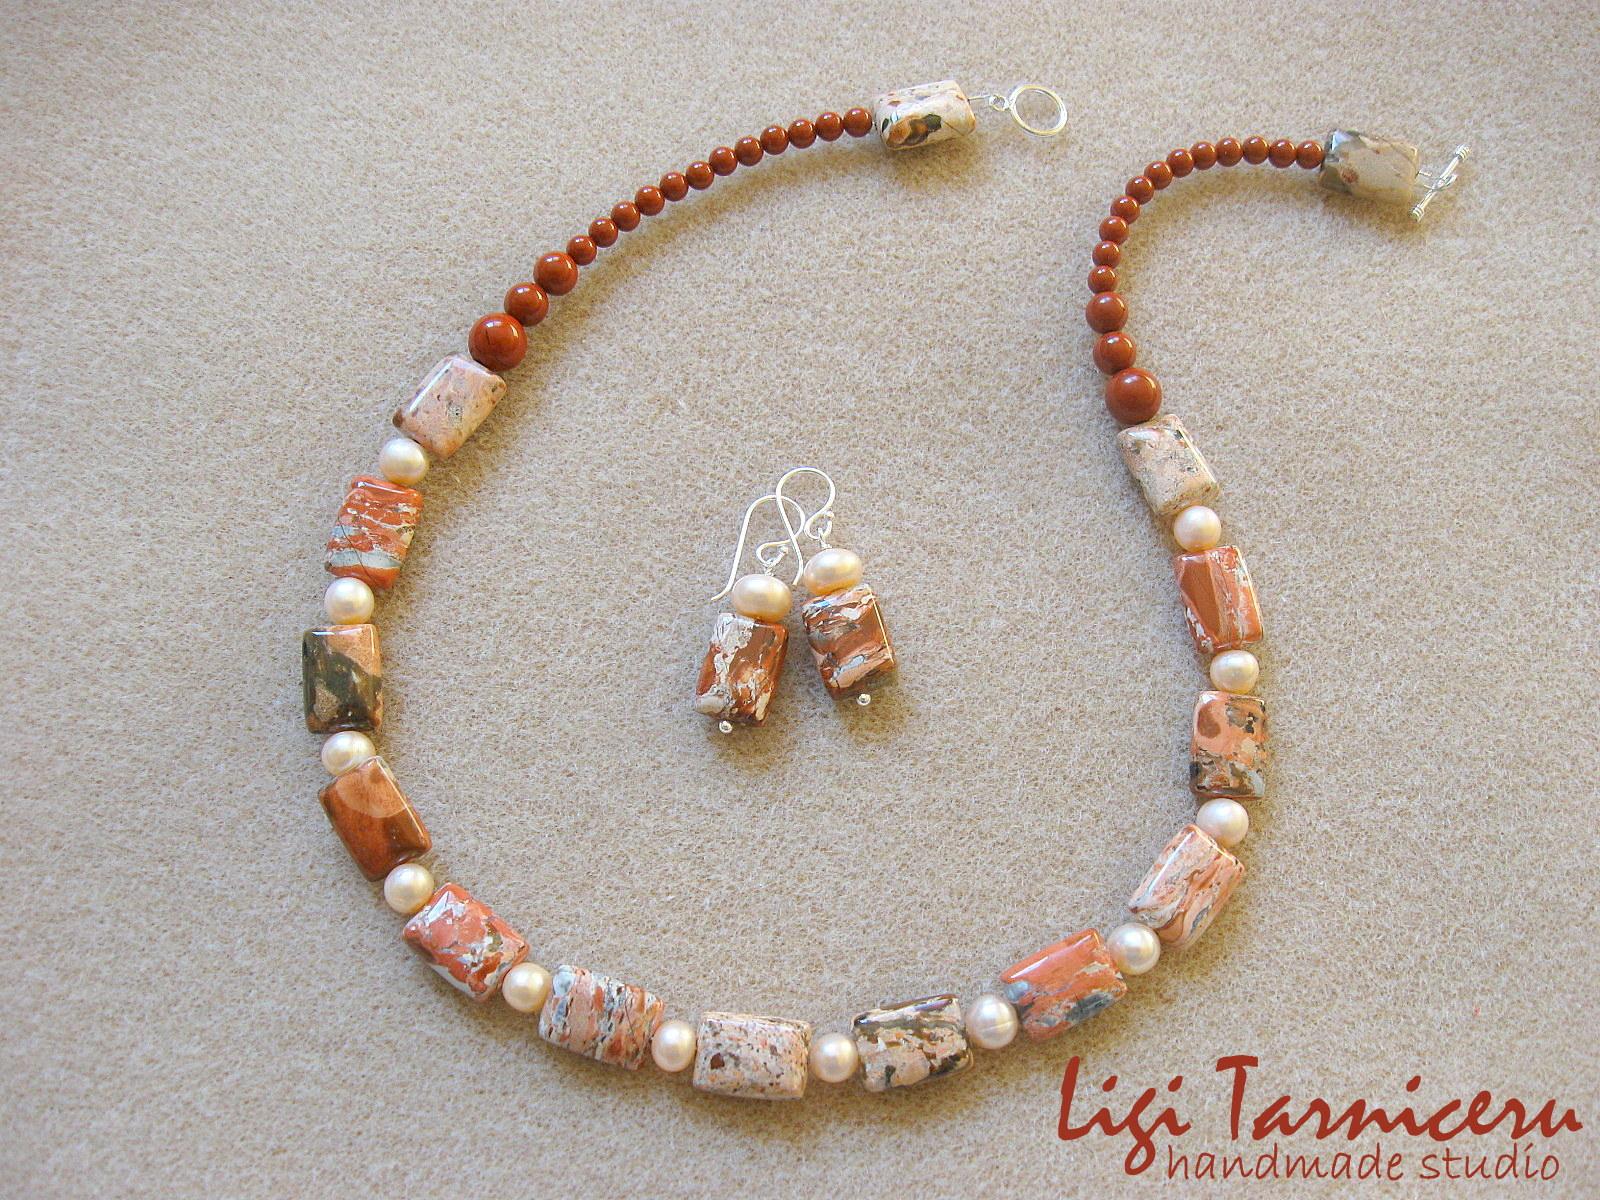 Brecciated jasper and freshwater pearls set